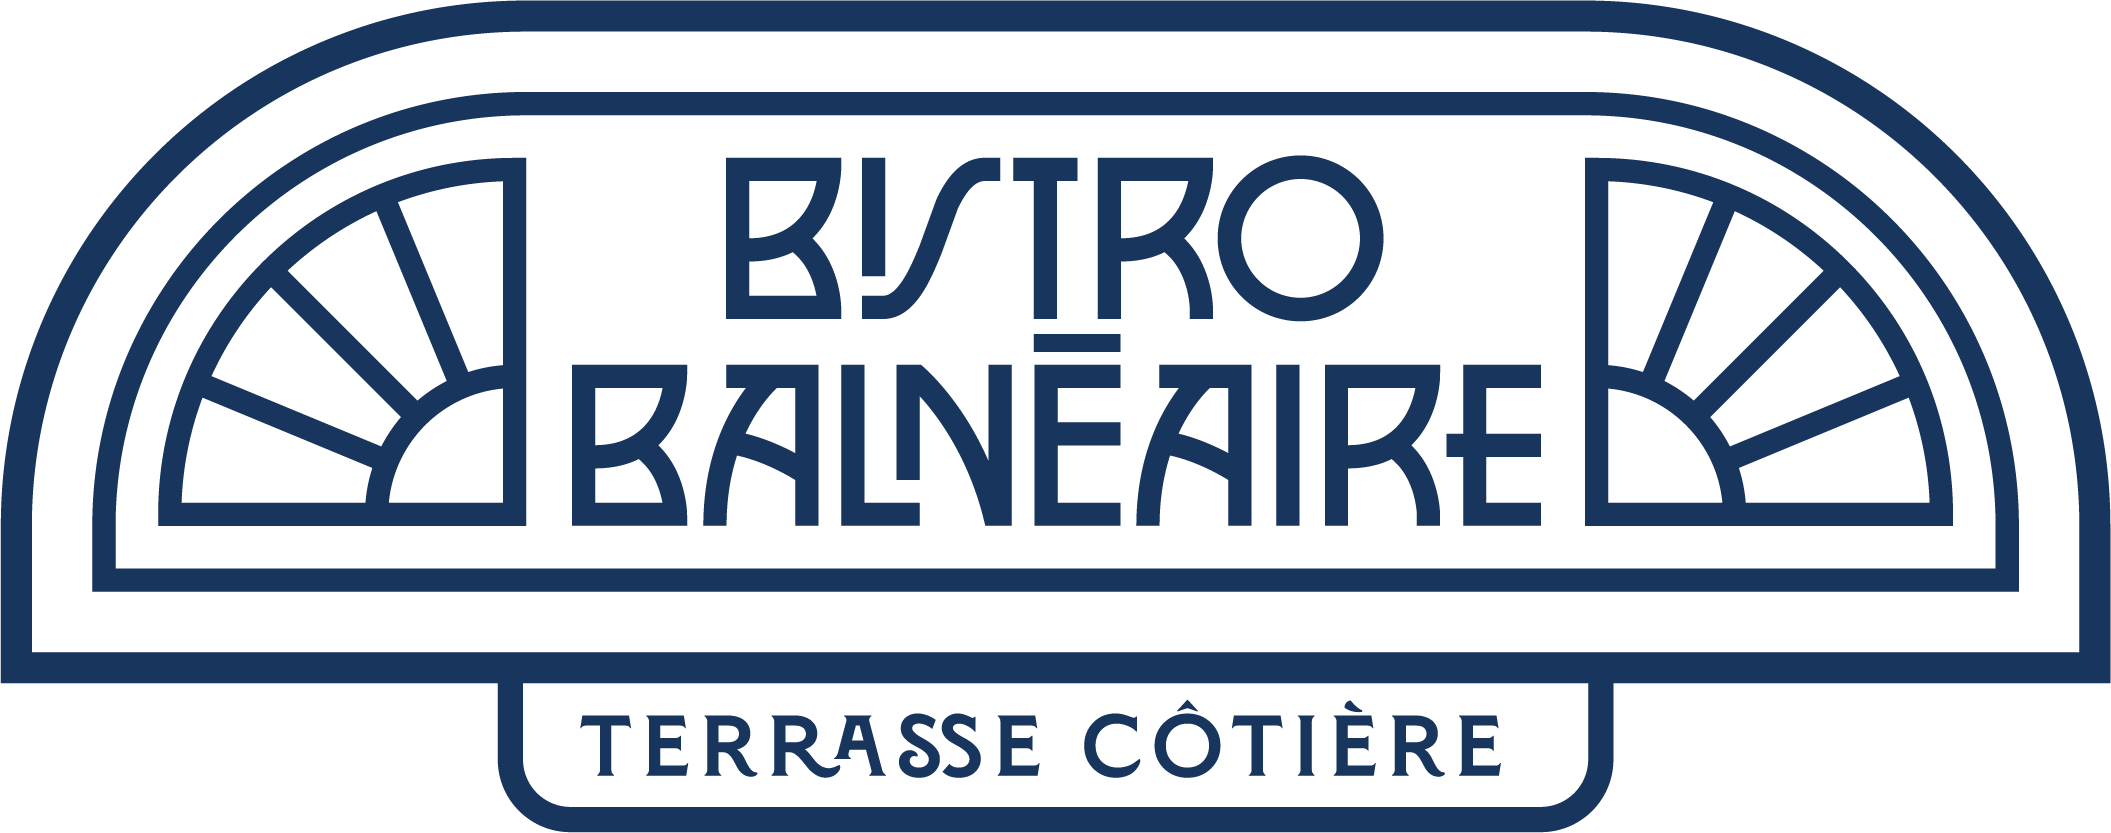 Logo Bistro Balnéaire